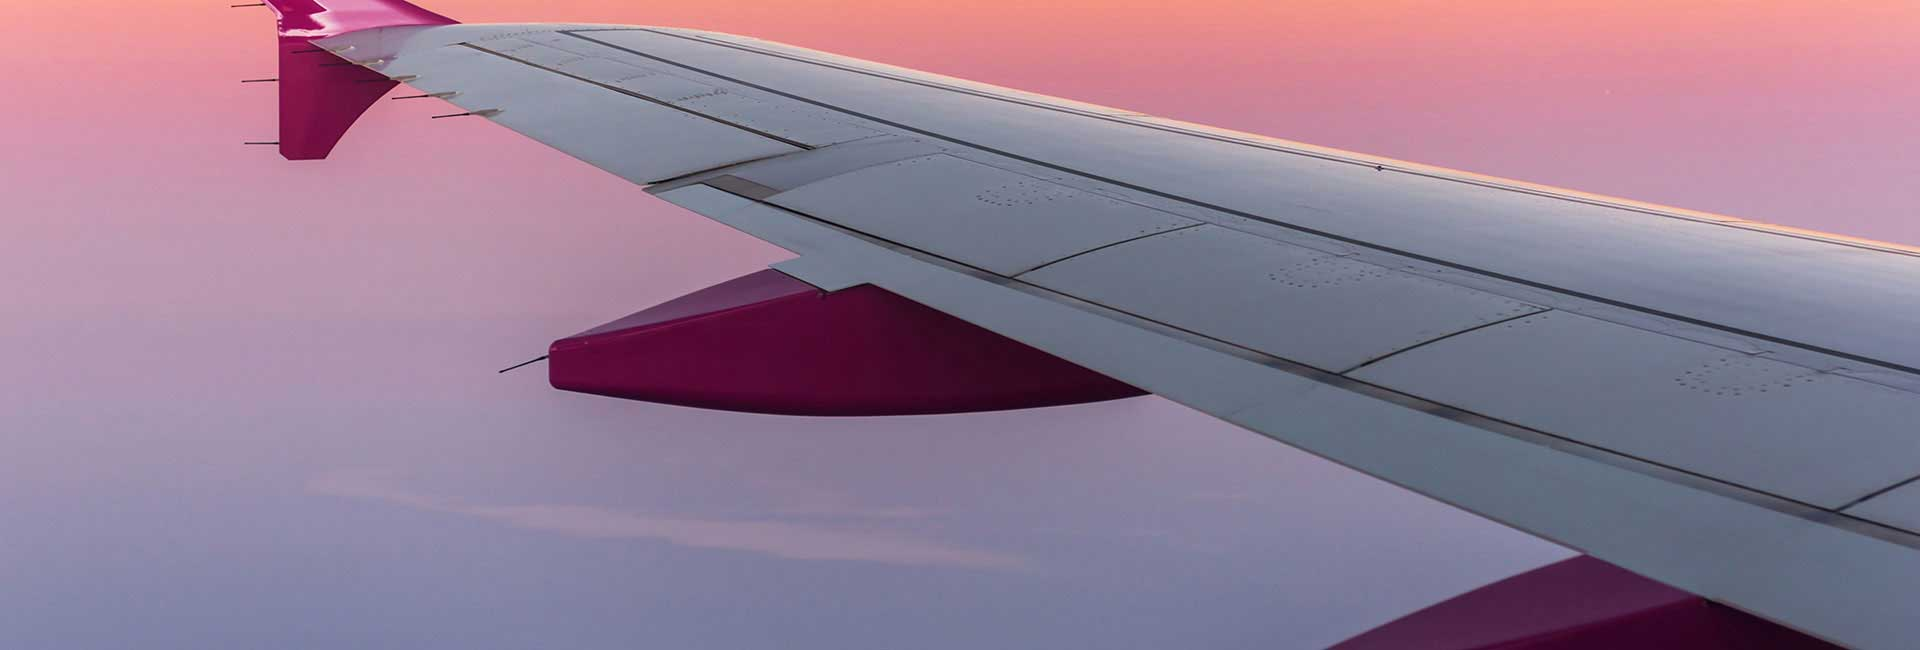 bilete avion agentie turism brasov 2